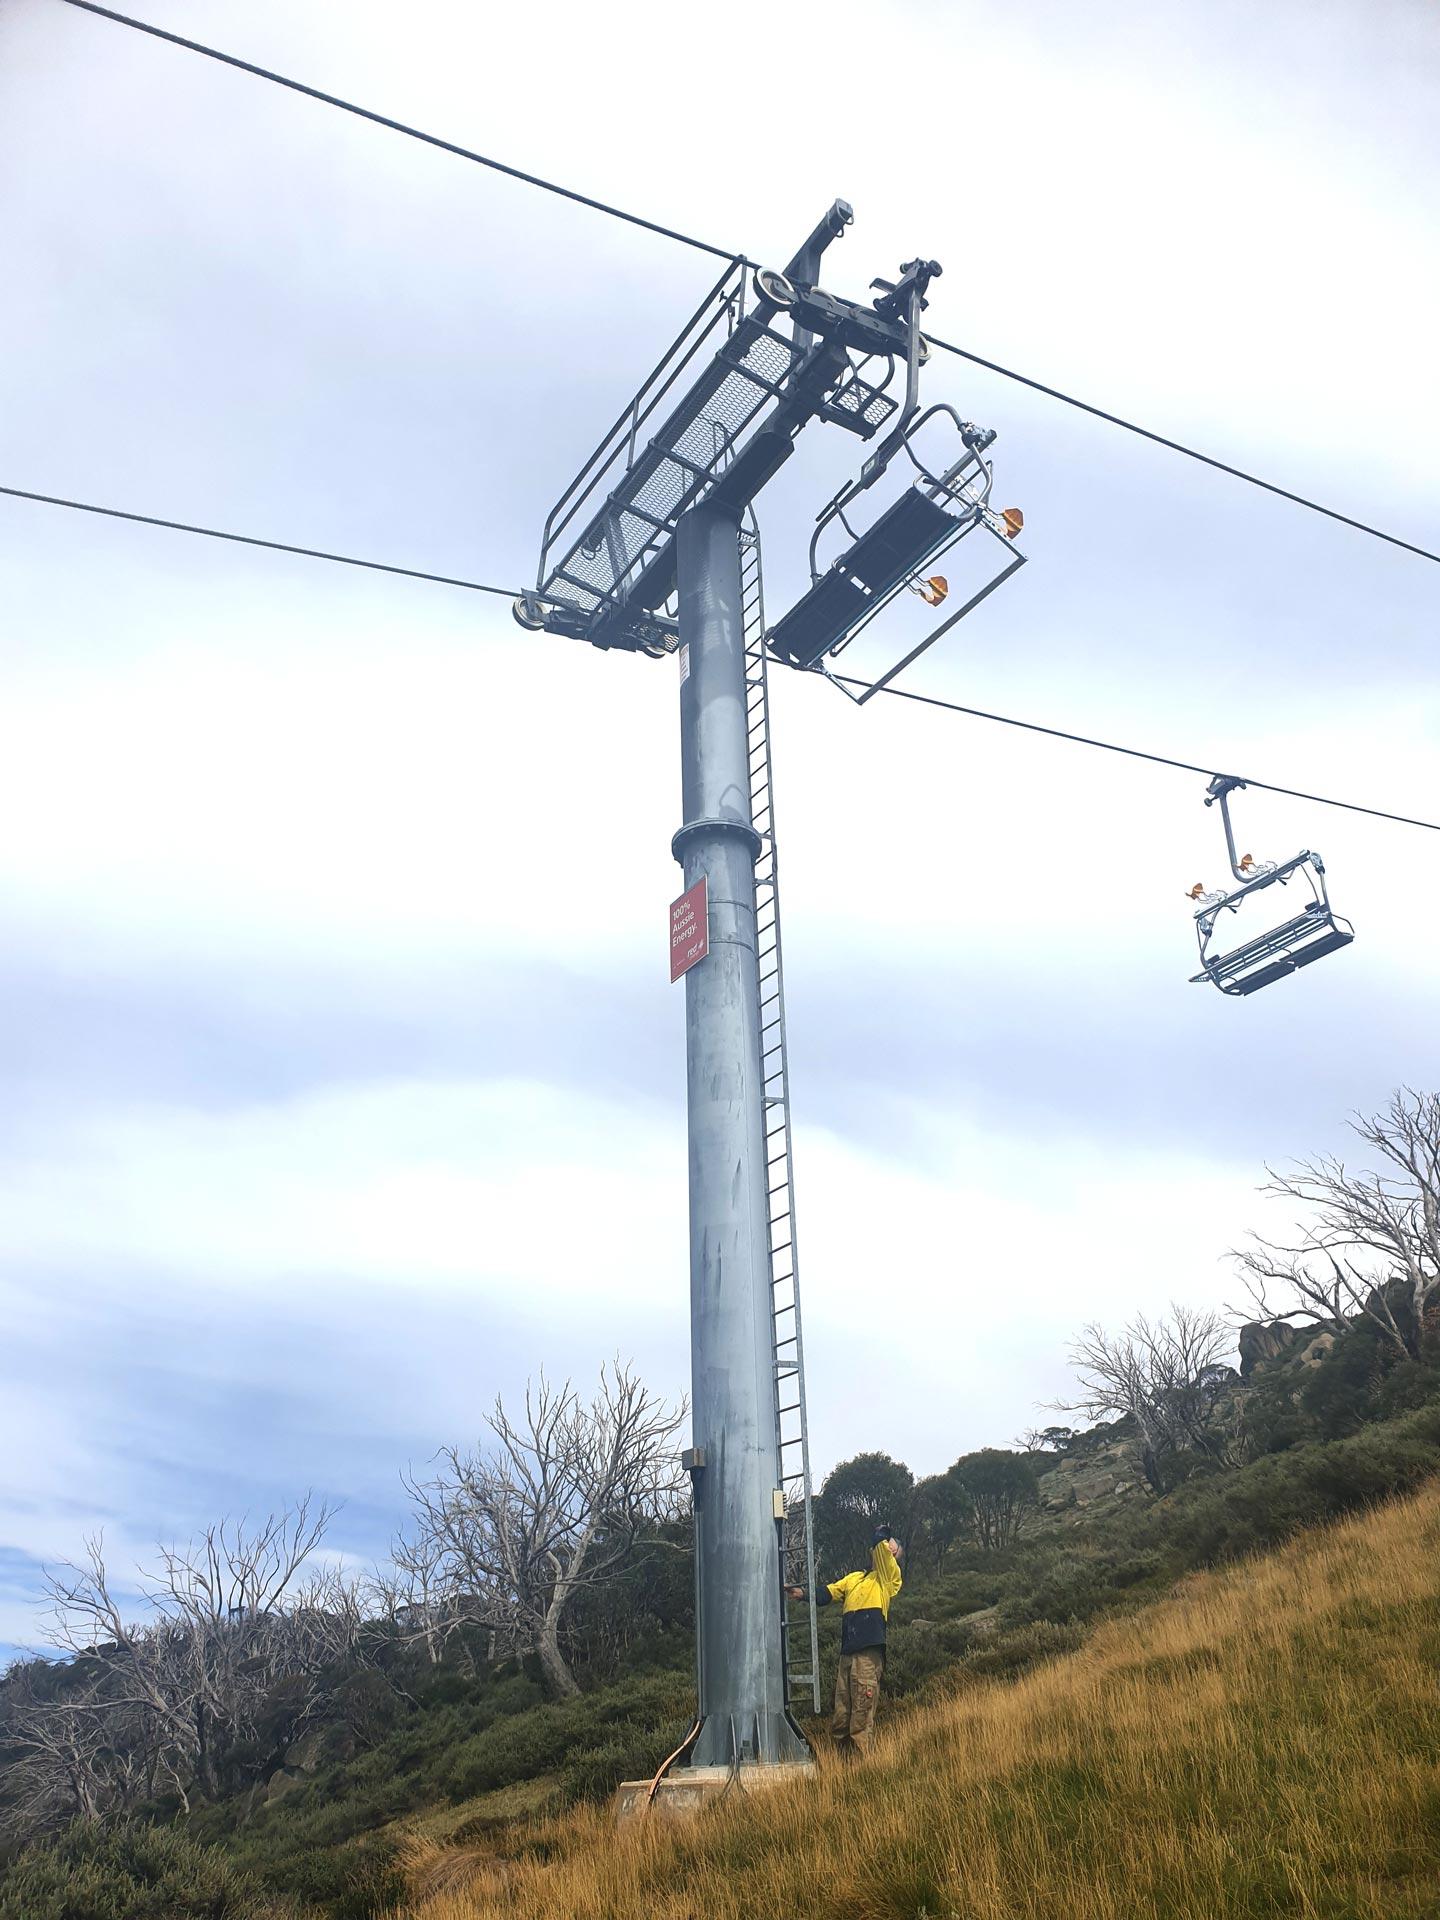 Lift Tower Maintenance Thredbo Ski Resorts